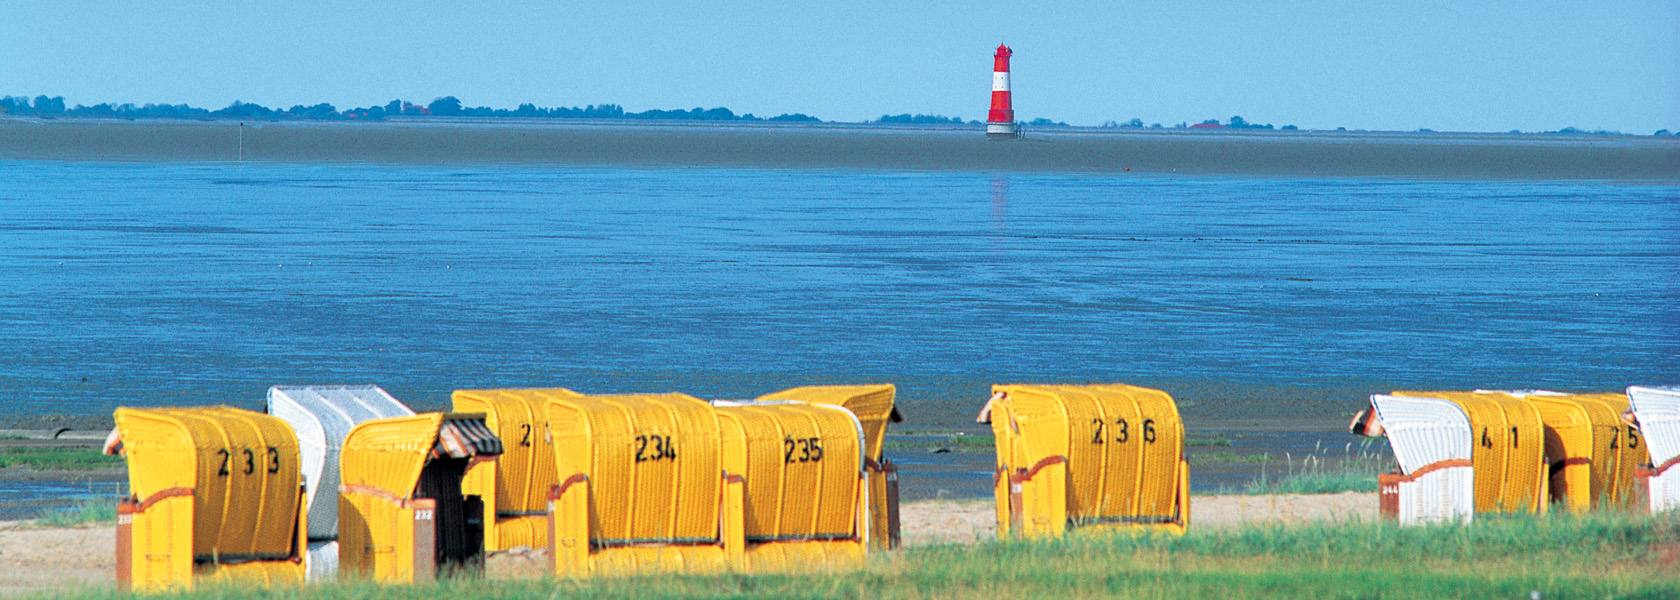 Strand Dangast, © Dirk Topel